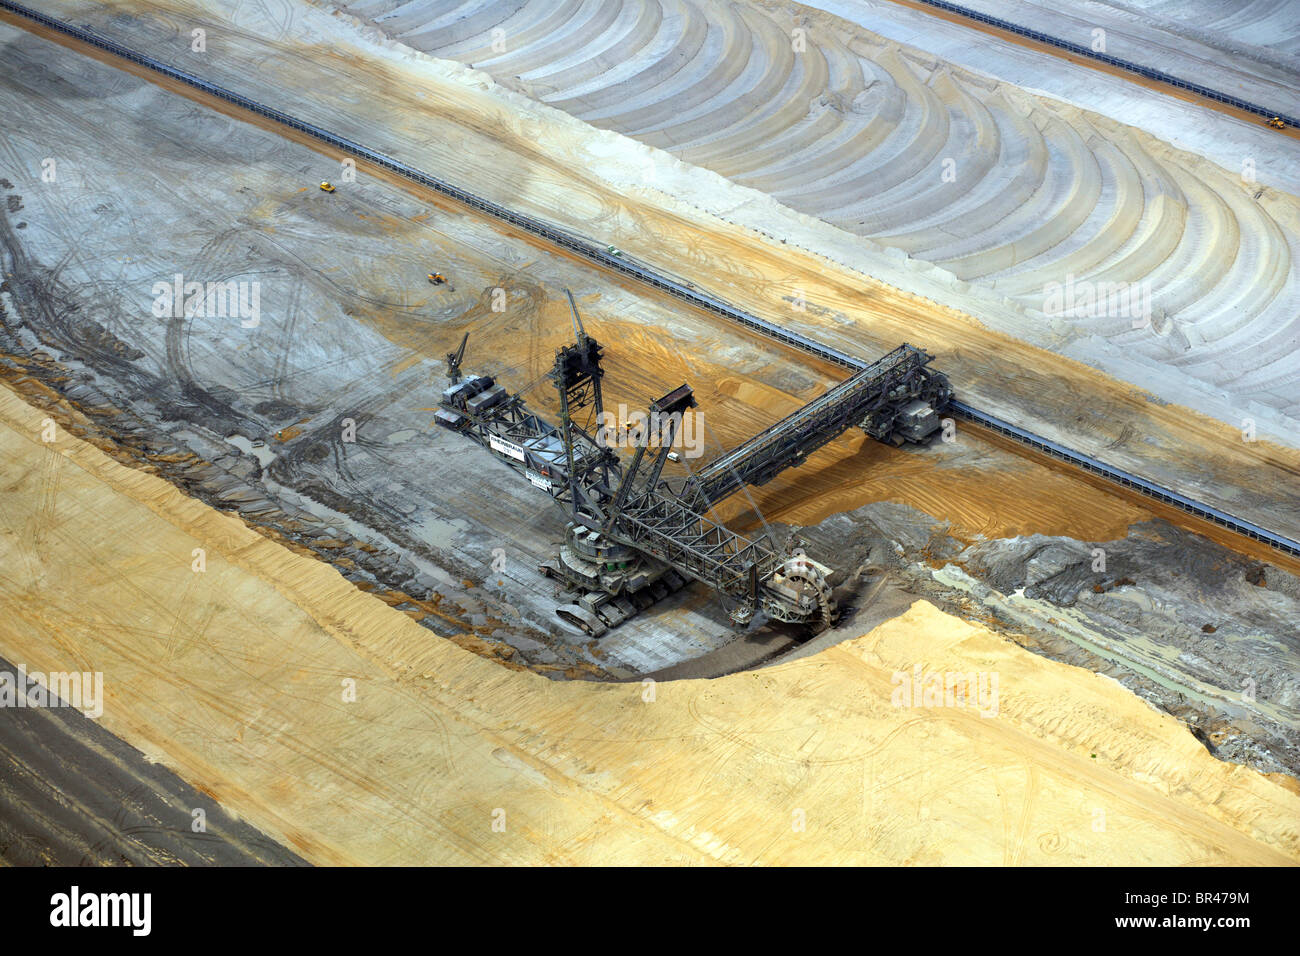 bucket-wheel excavator at brown coal surface mining, Germany, North Rhine-Westphalia, Hambach Stock Photo